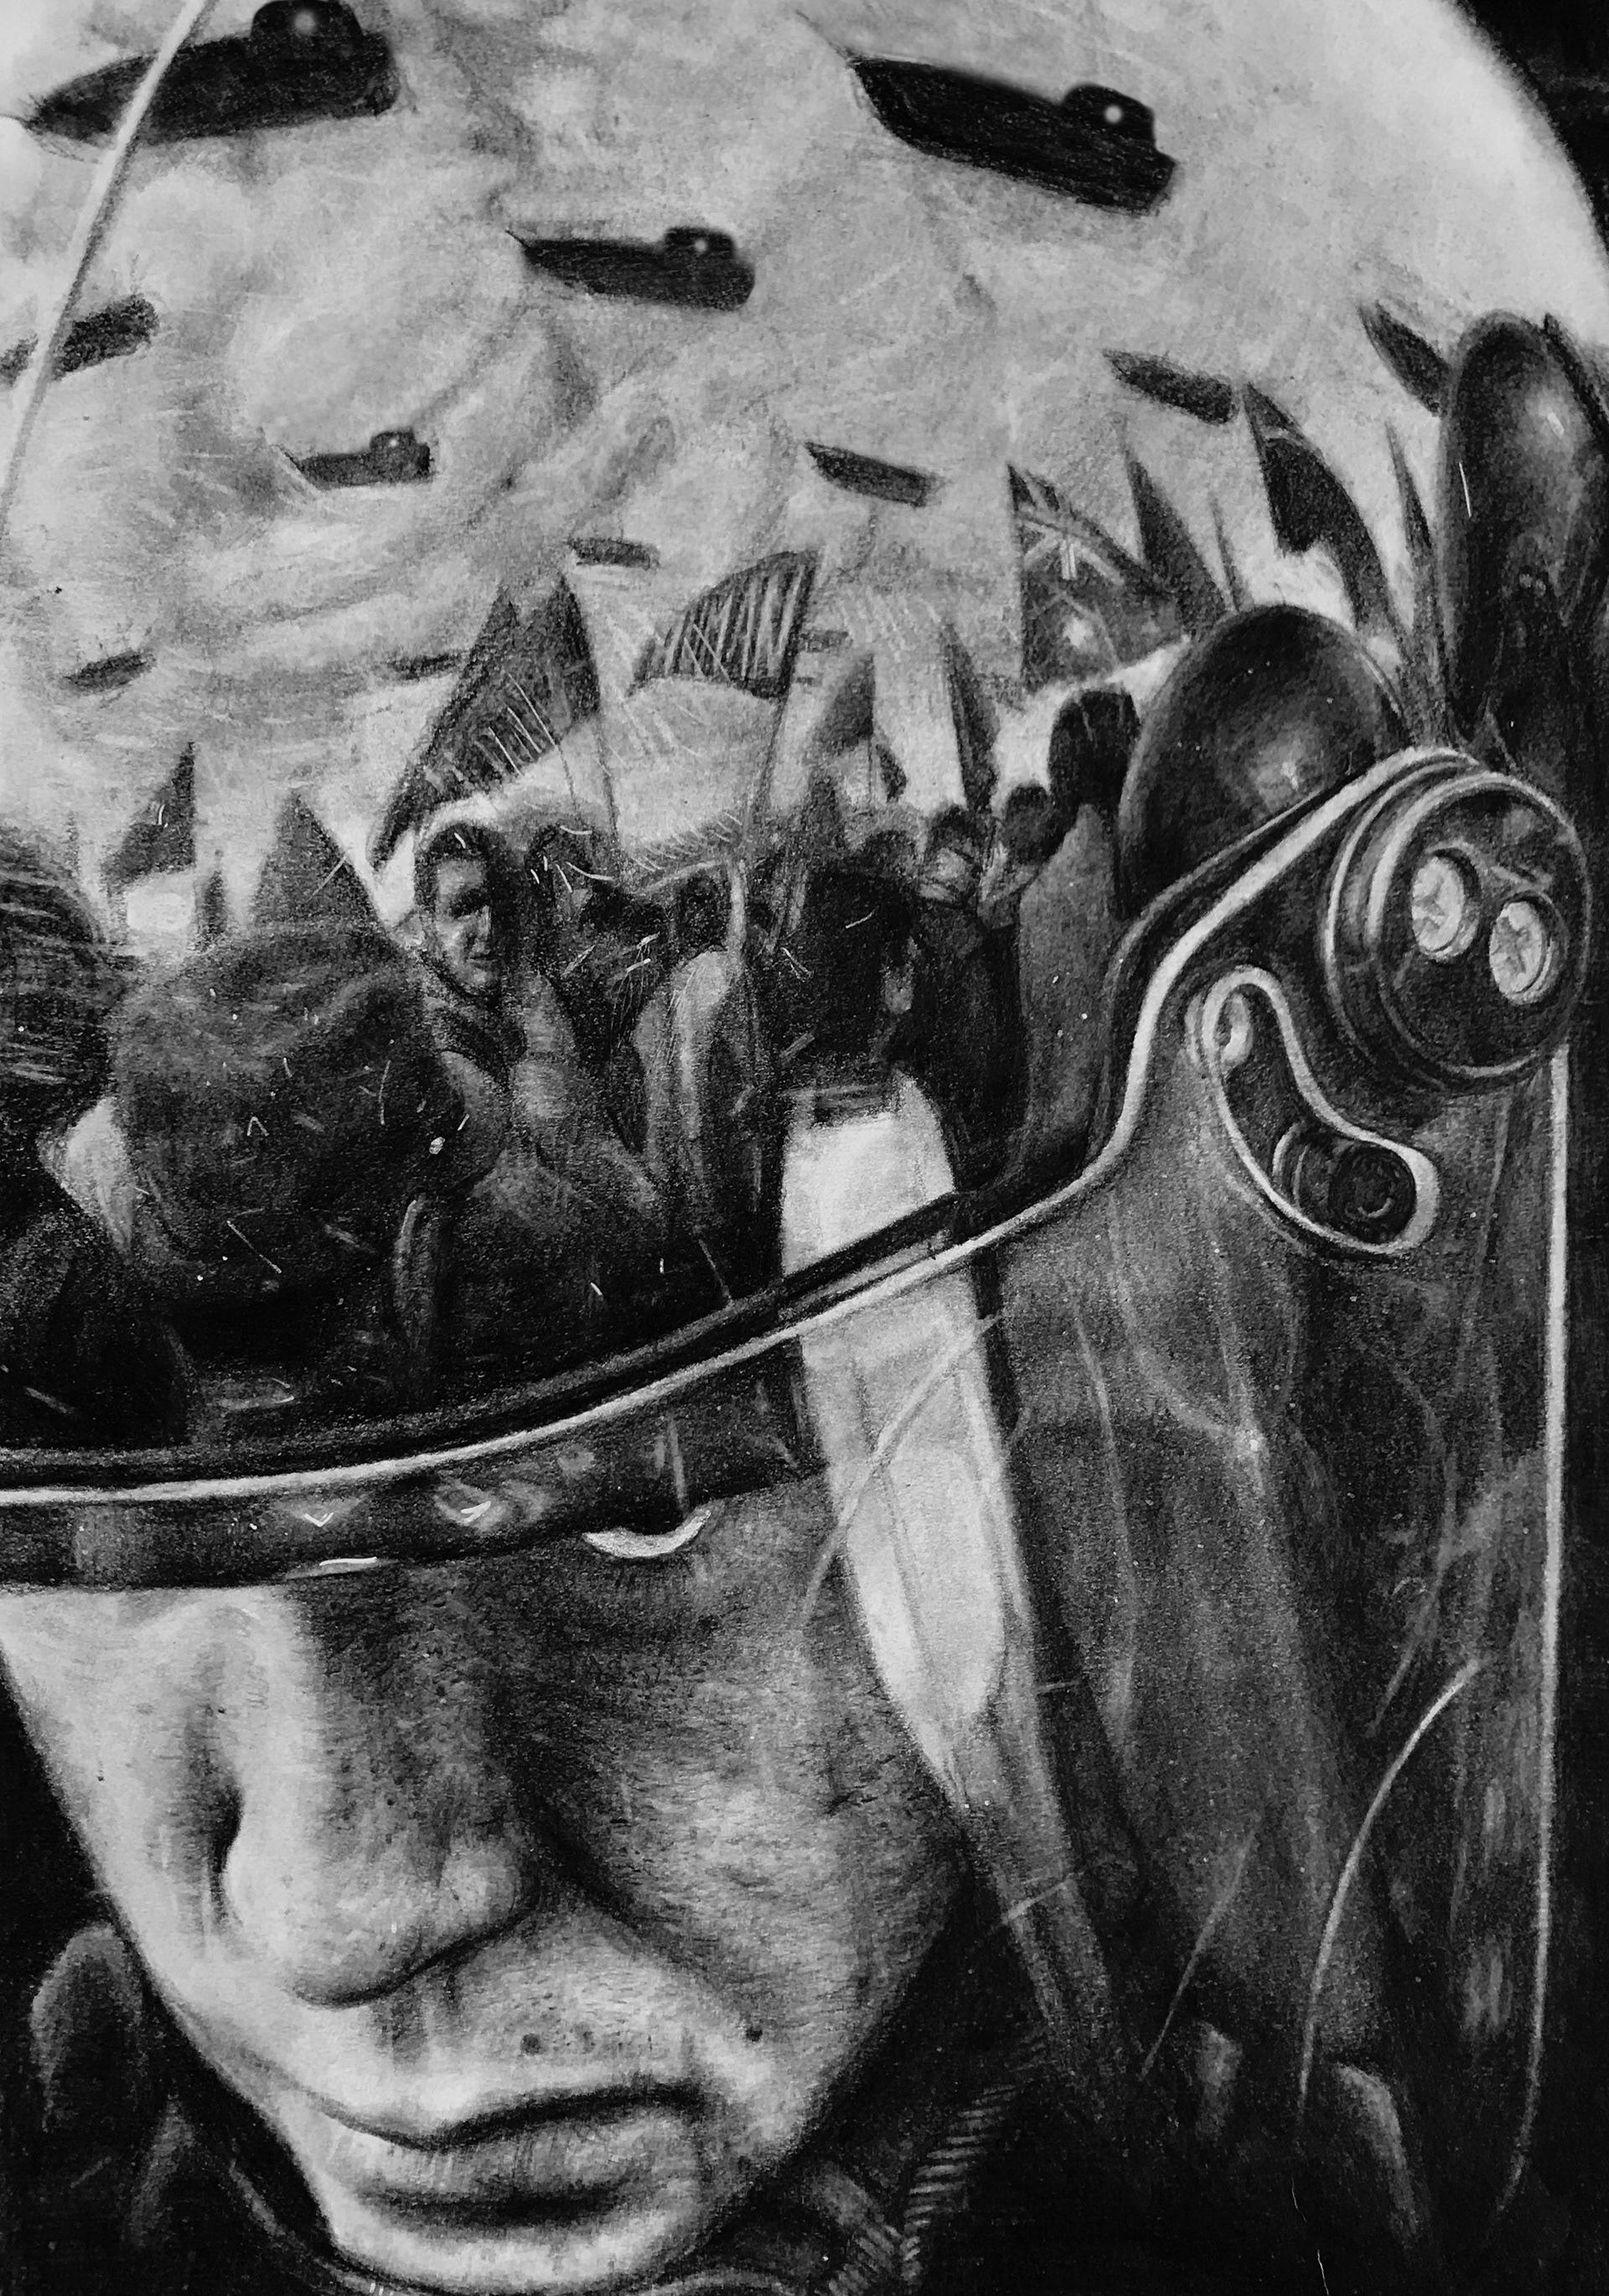 Ryan Oxford - ART UNIT 4